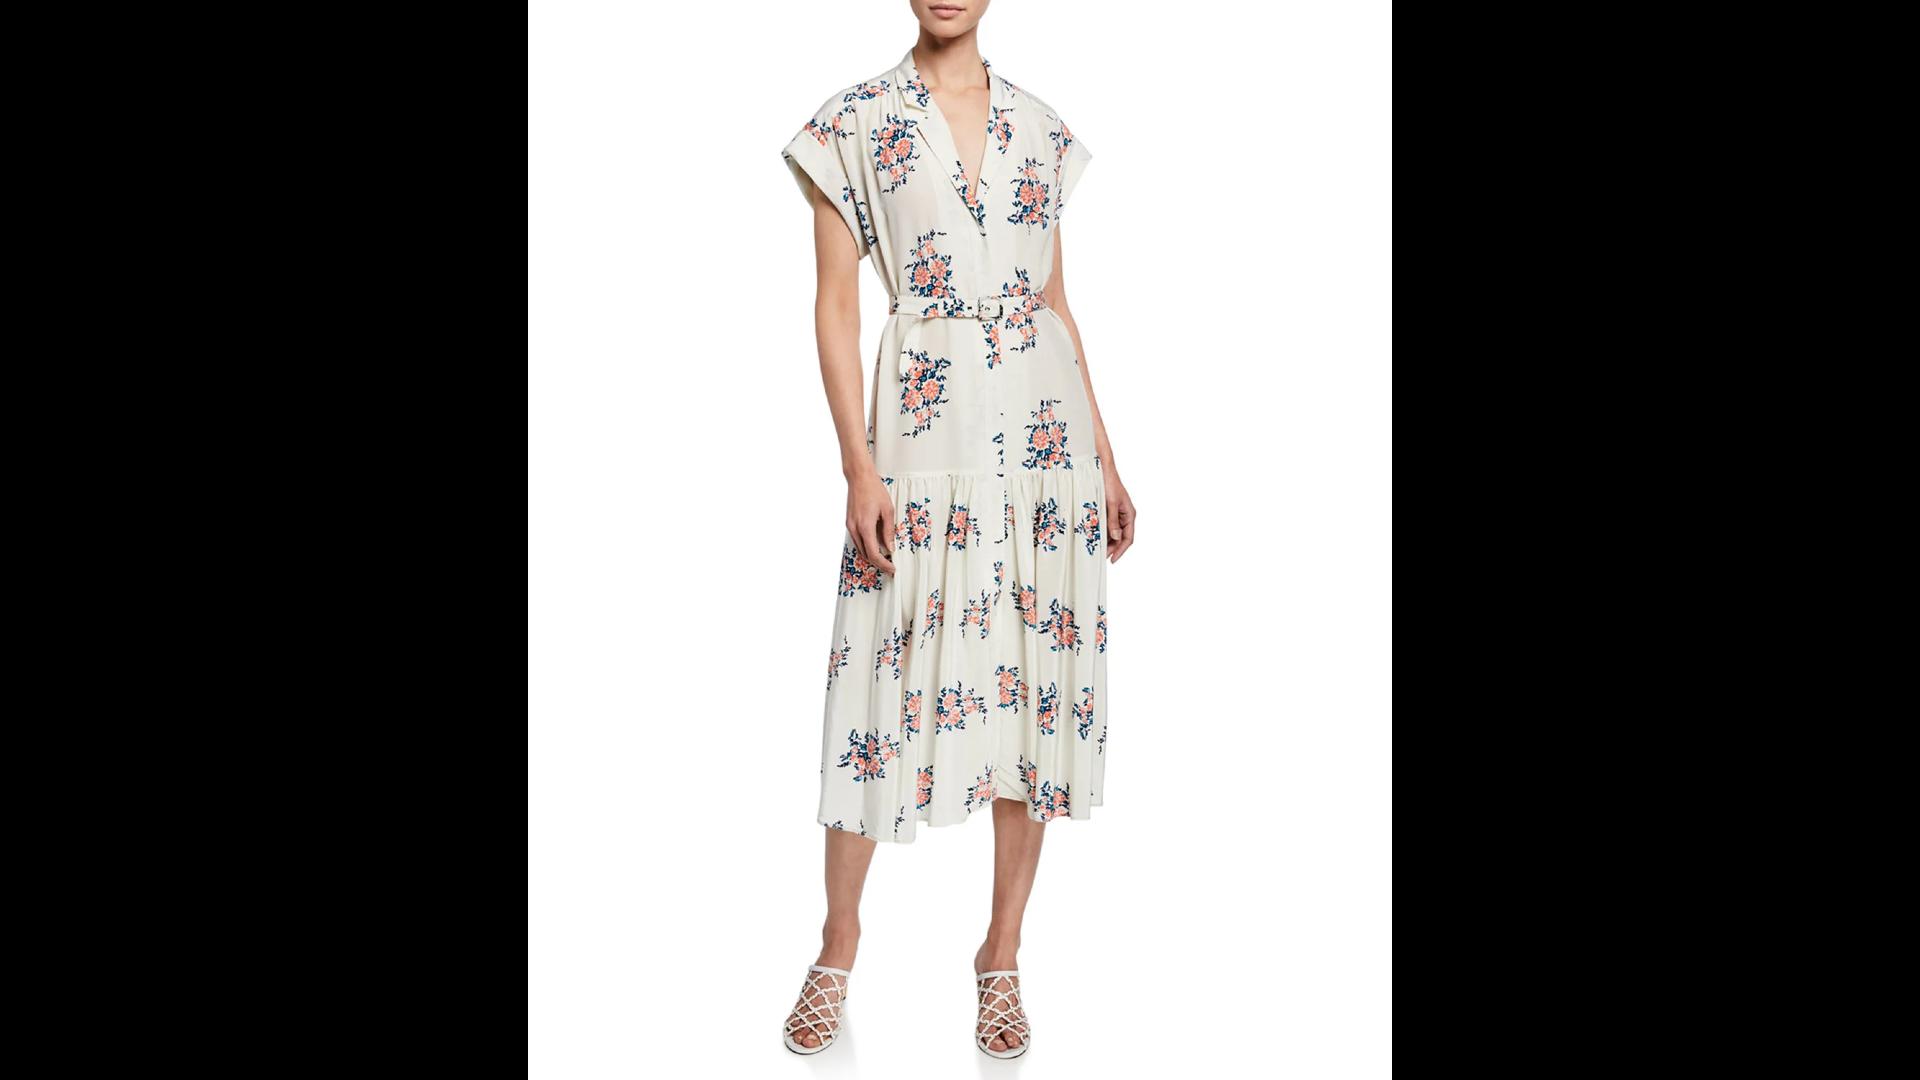 Veronica Beard Meagan Floral Dropped-Waist Midi Dress